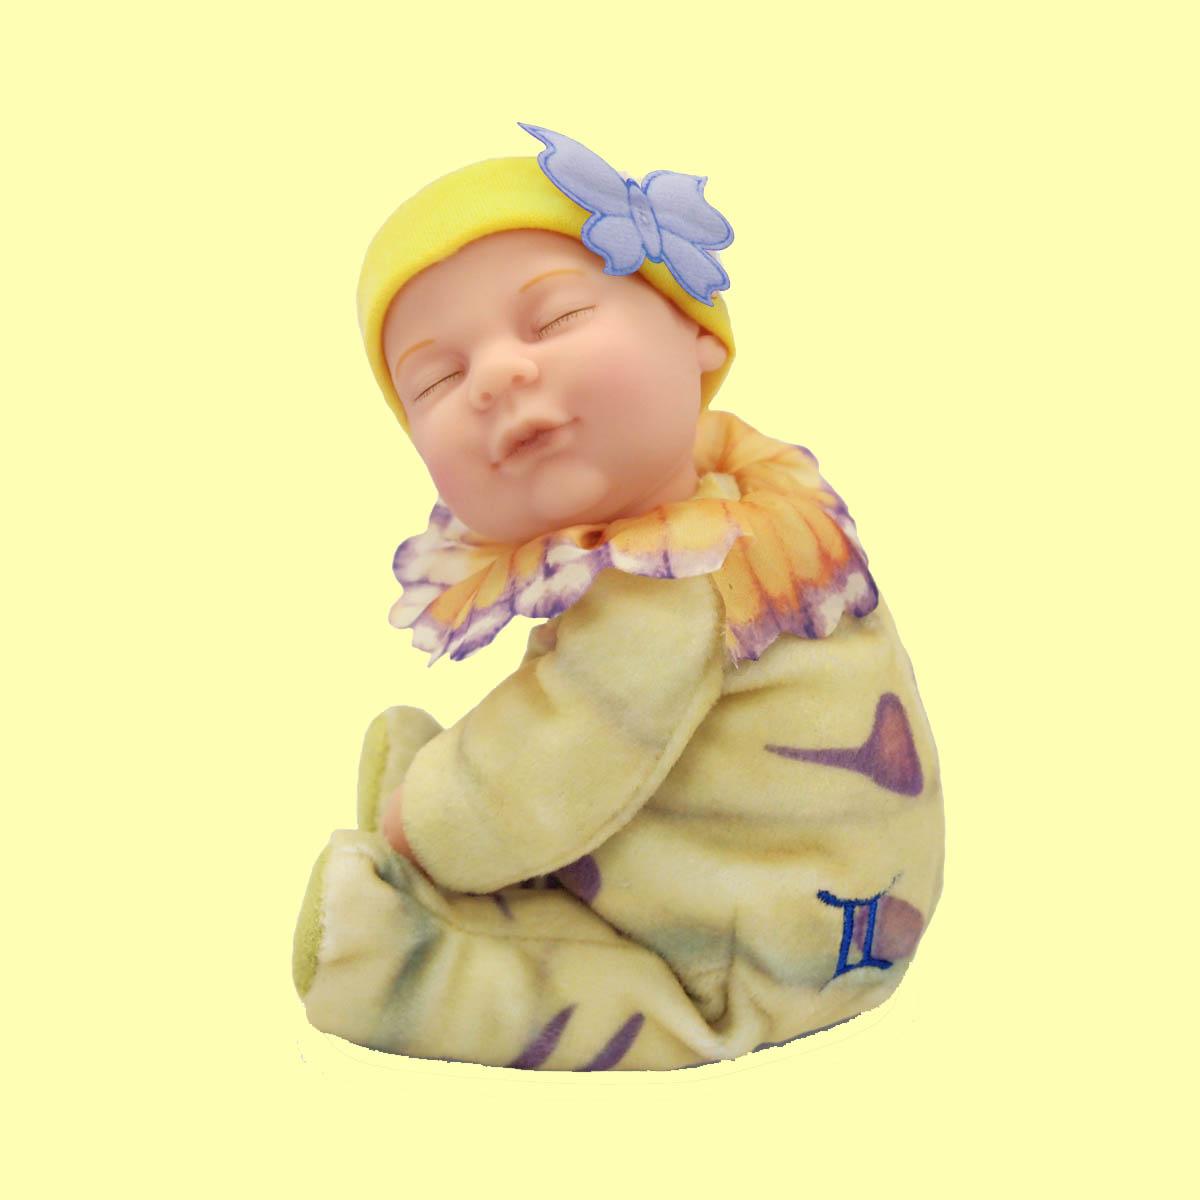 Кукла из серии Детки-знаки зодиака – БлизнецыКуклы детки ANNE GEDDES<br>Кукла из серии Детки-знаки зодиака – Близнецы<br>